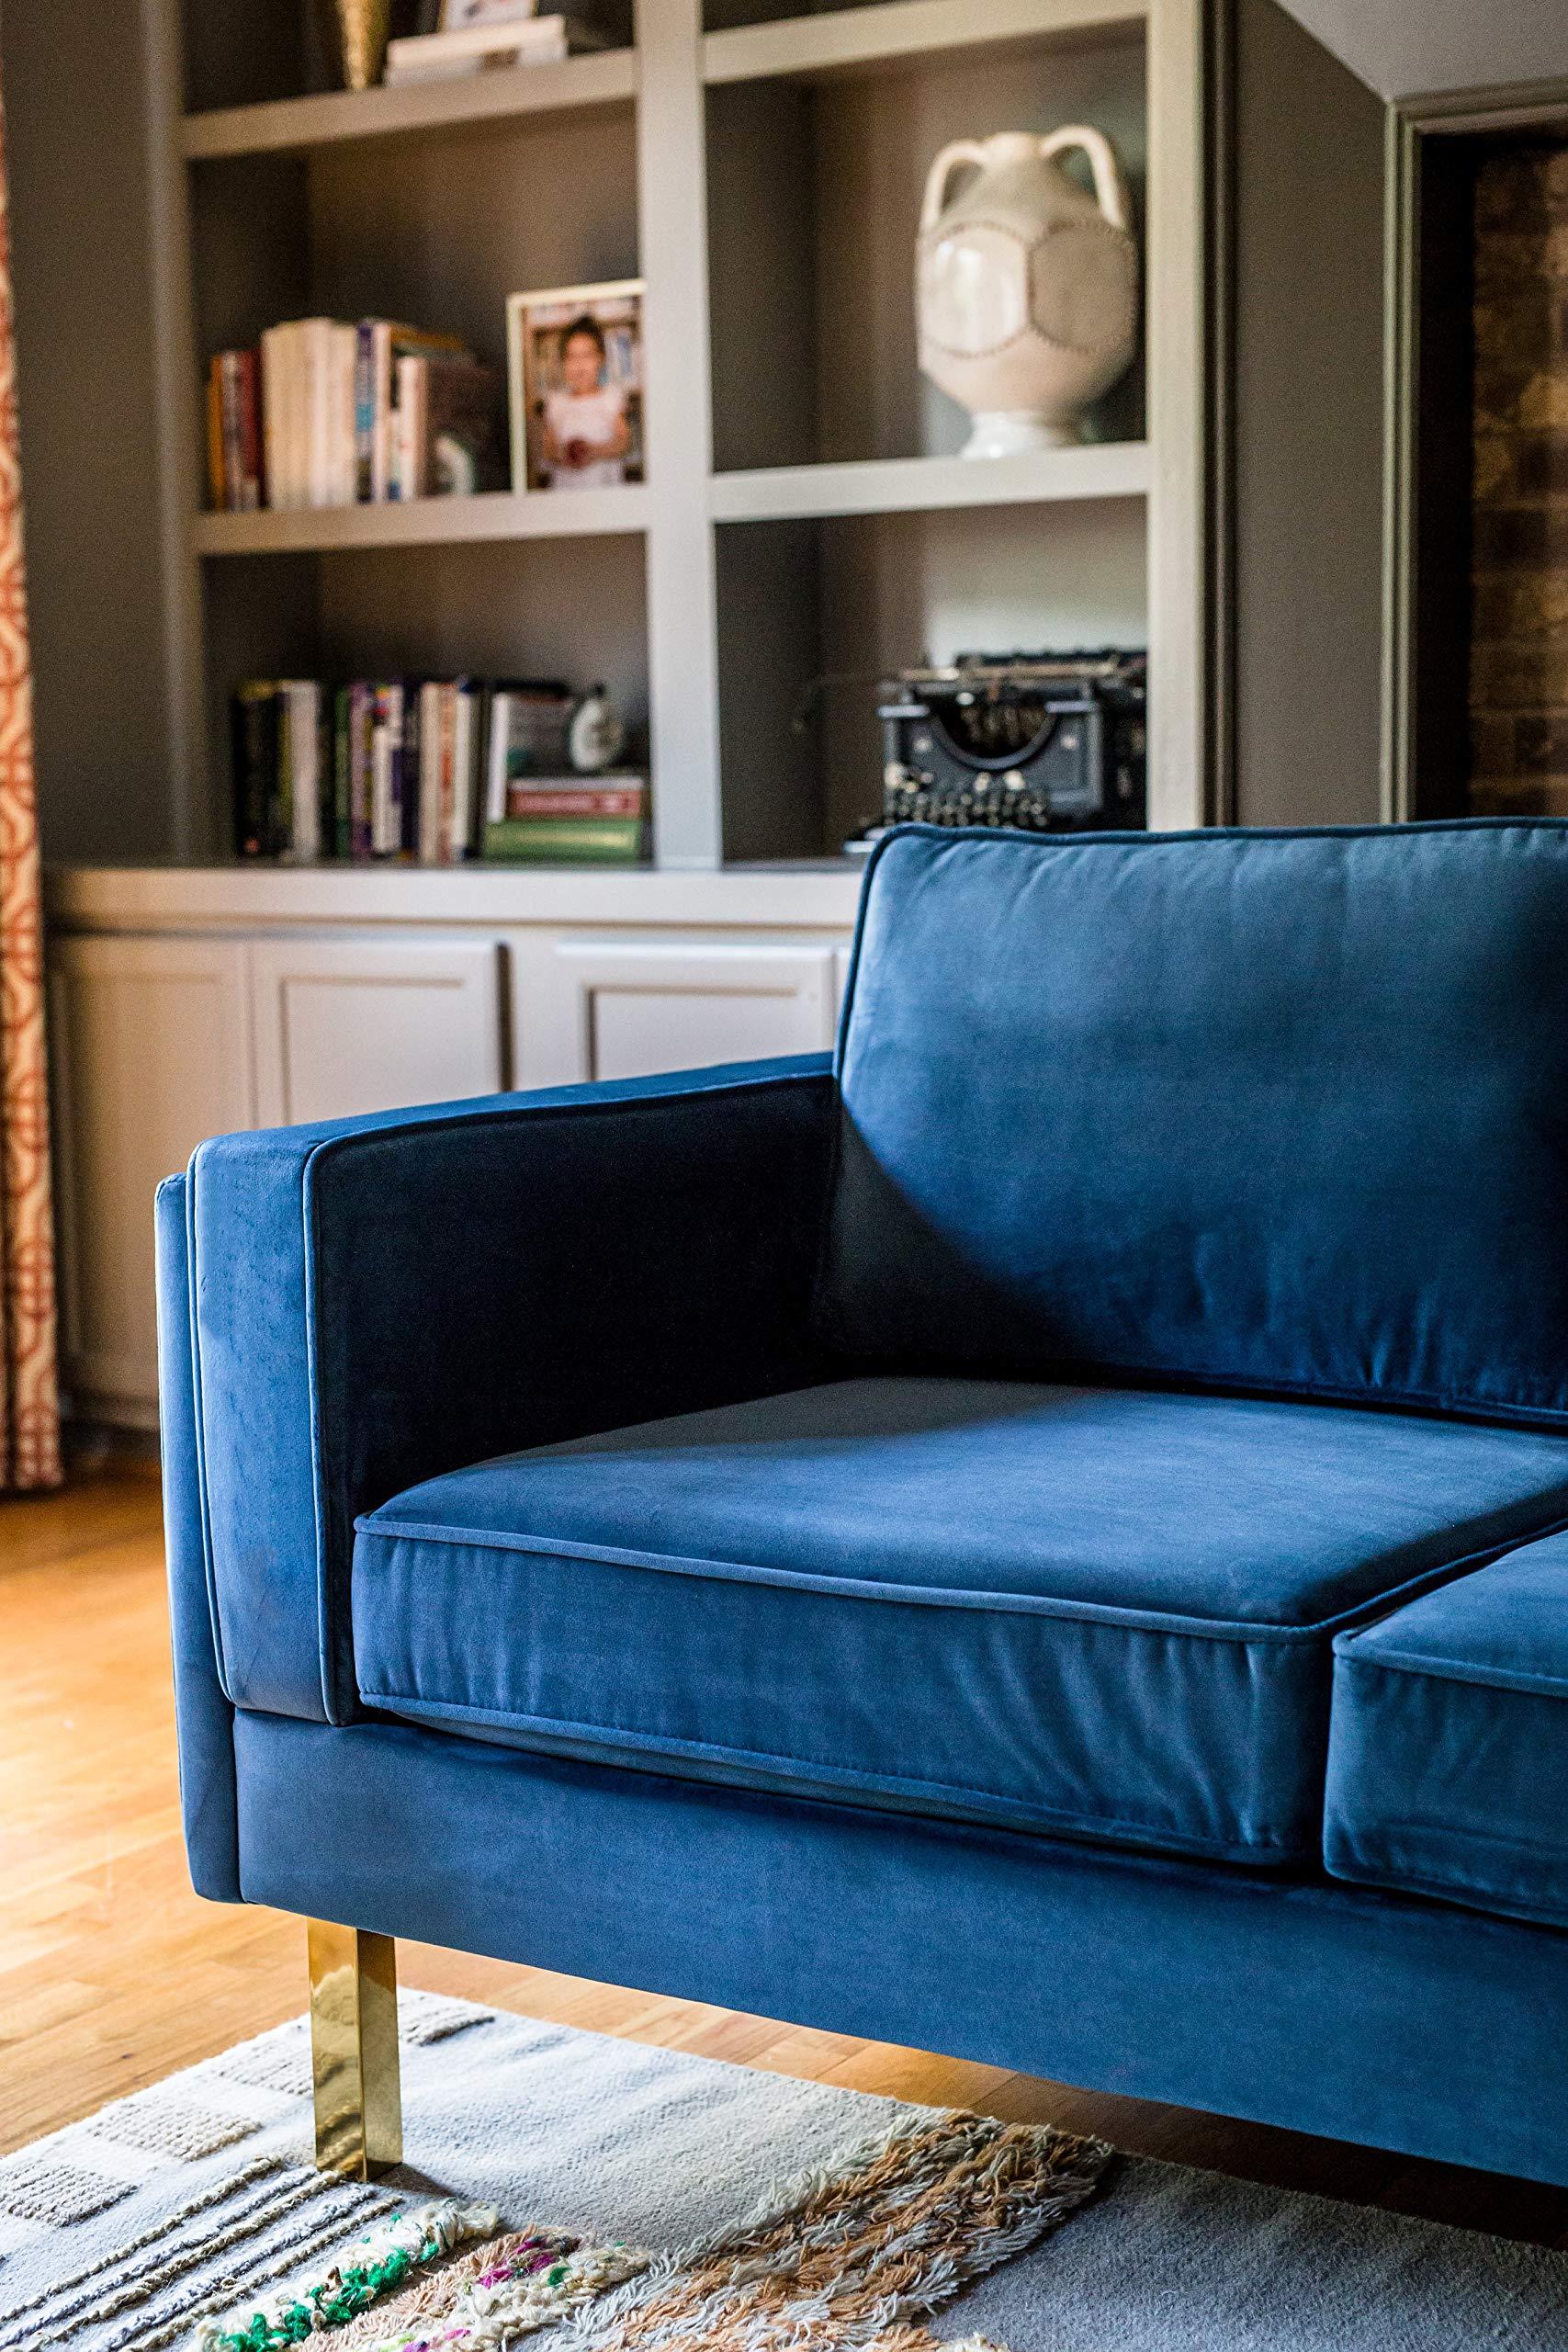 Pleasant Edloe Finch Midcentury Modern Lexington Blue Velvet Sofa 87 Bralicious Painted Fabric Chair Ideas Braliciousco